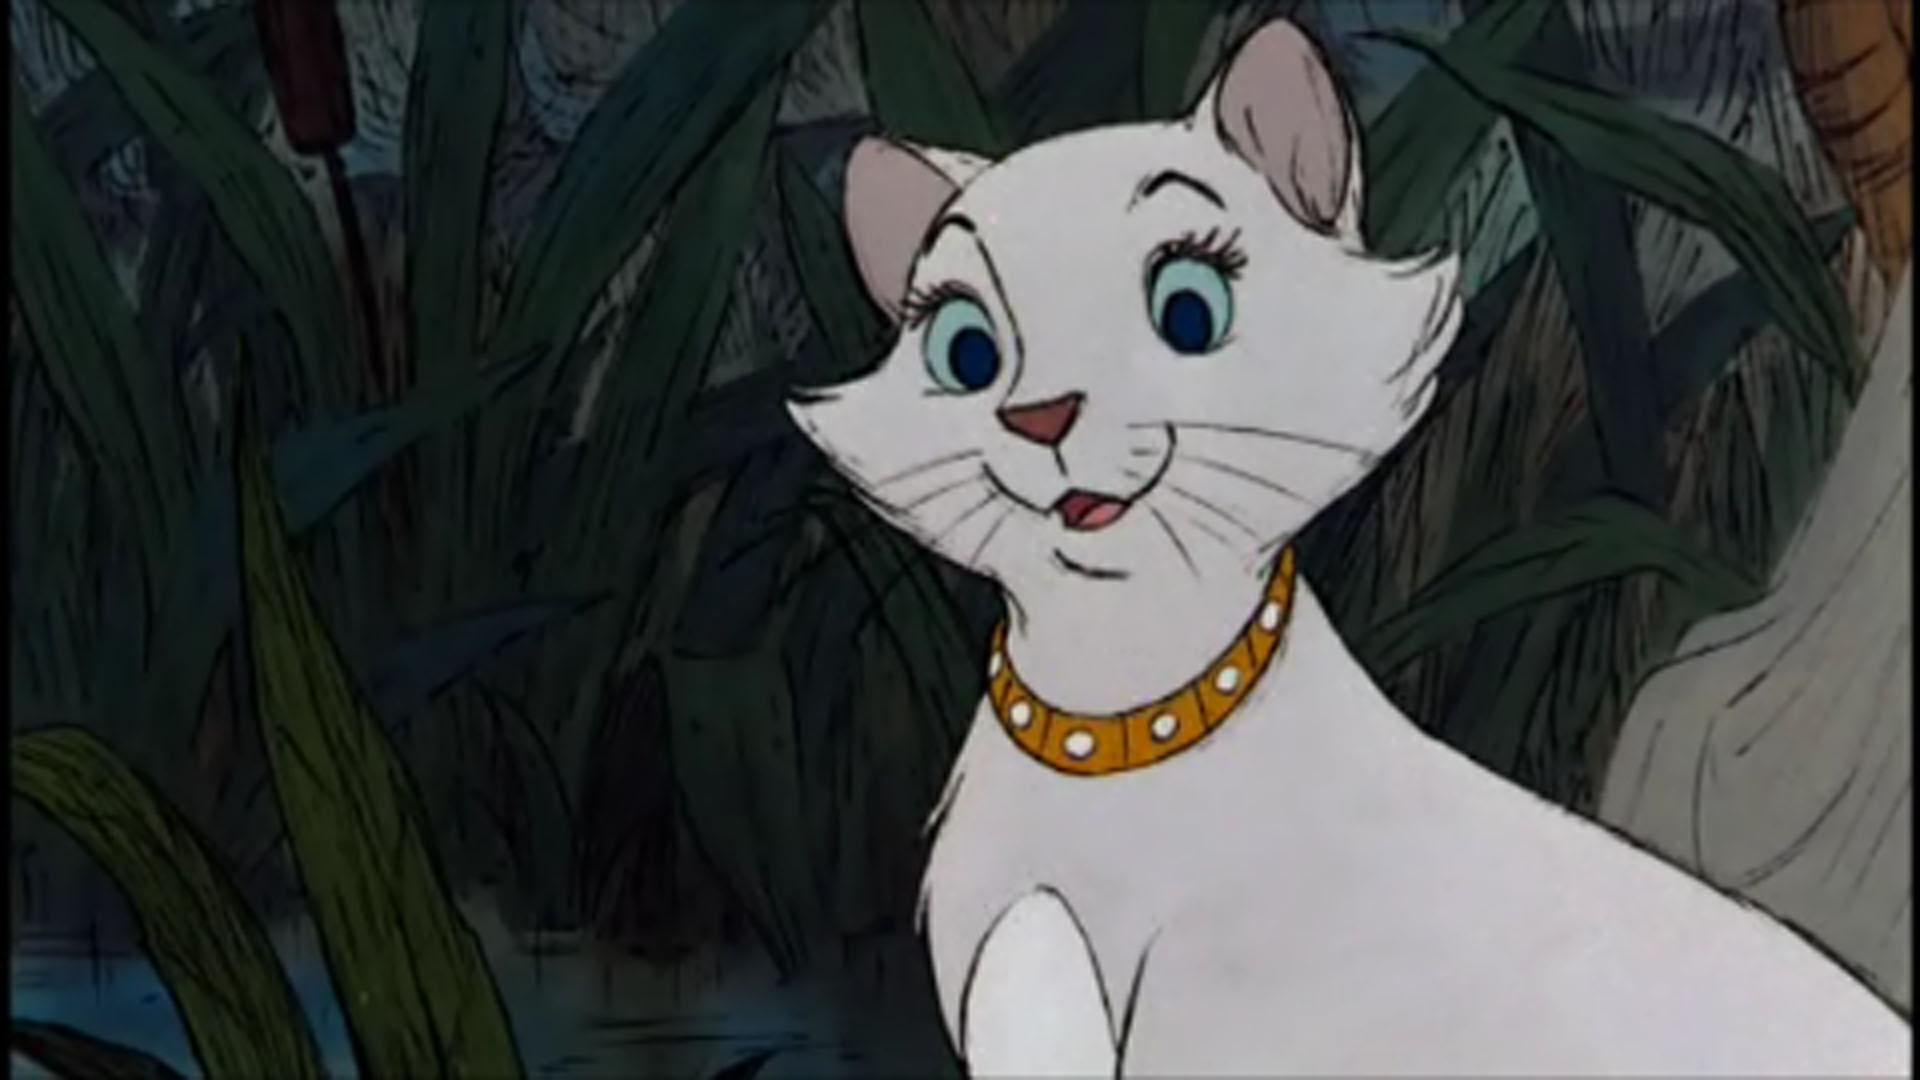 Duchess (character) | Nuemek Movie Wikia | FANDOM powered ...